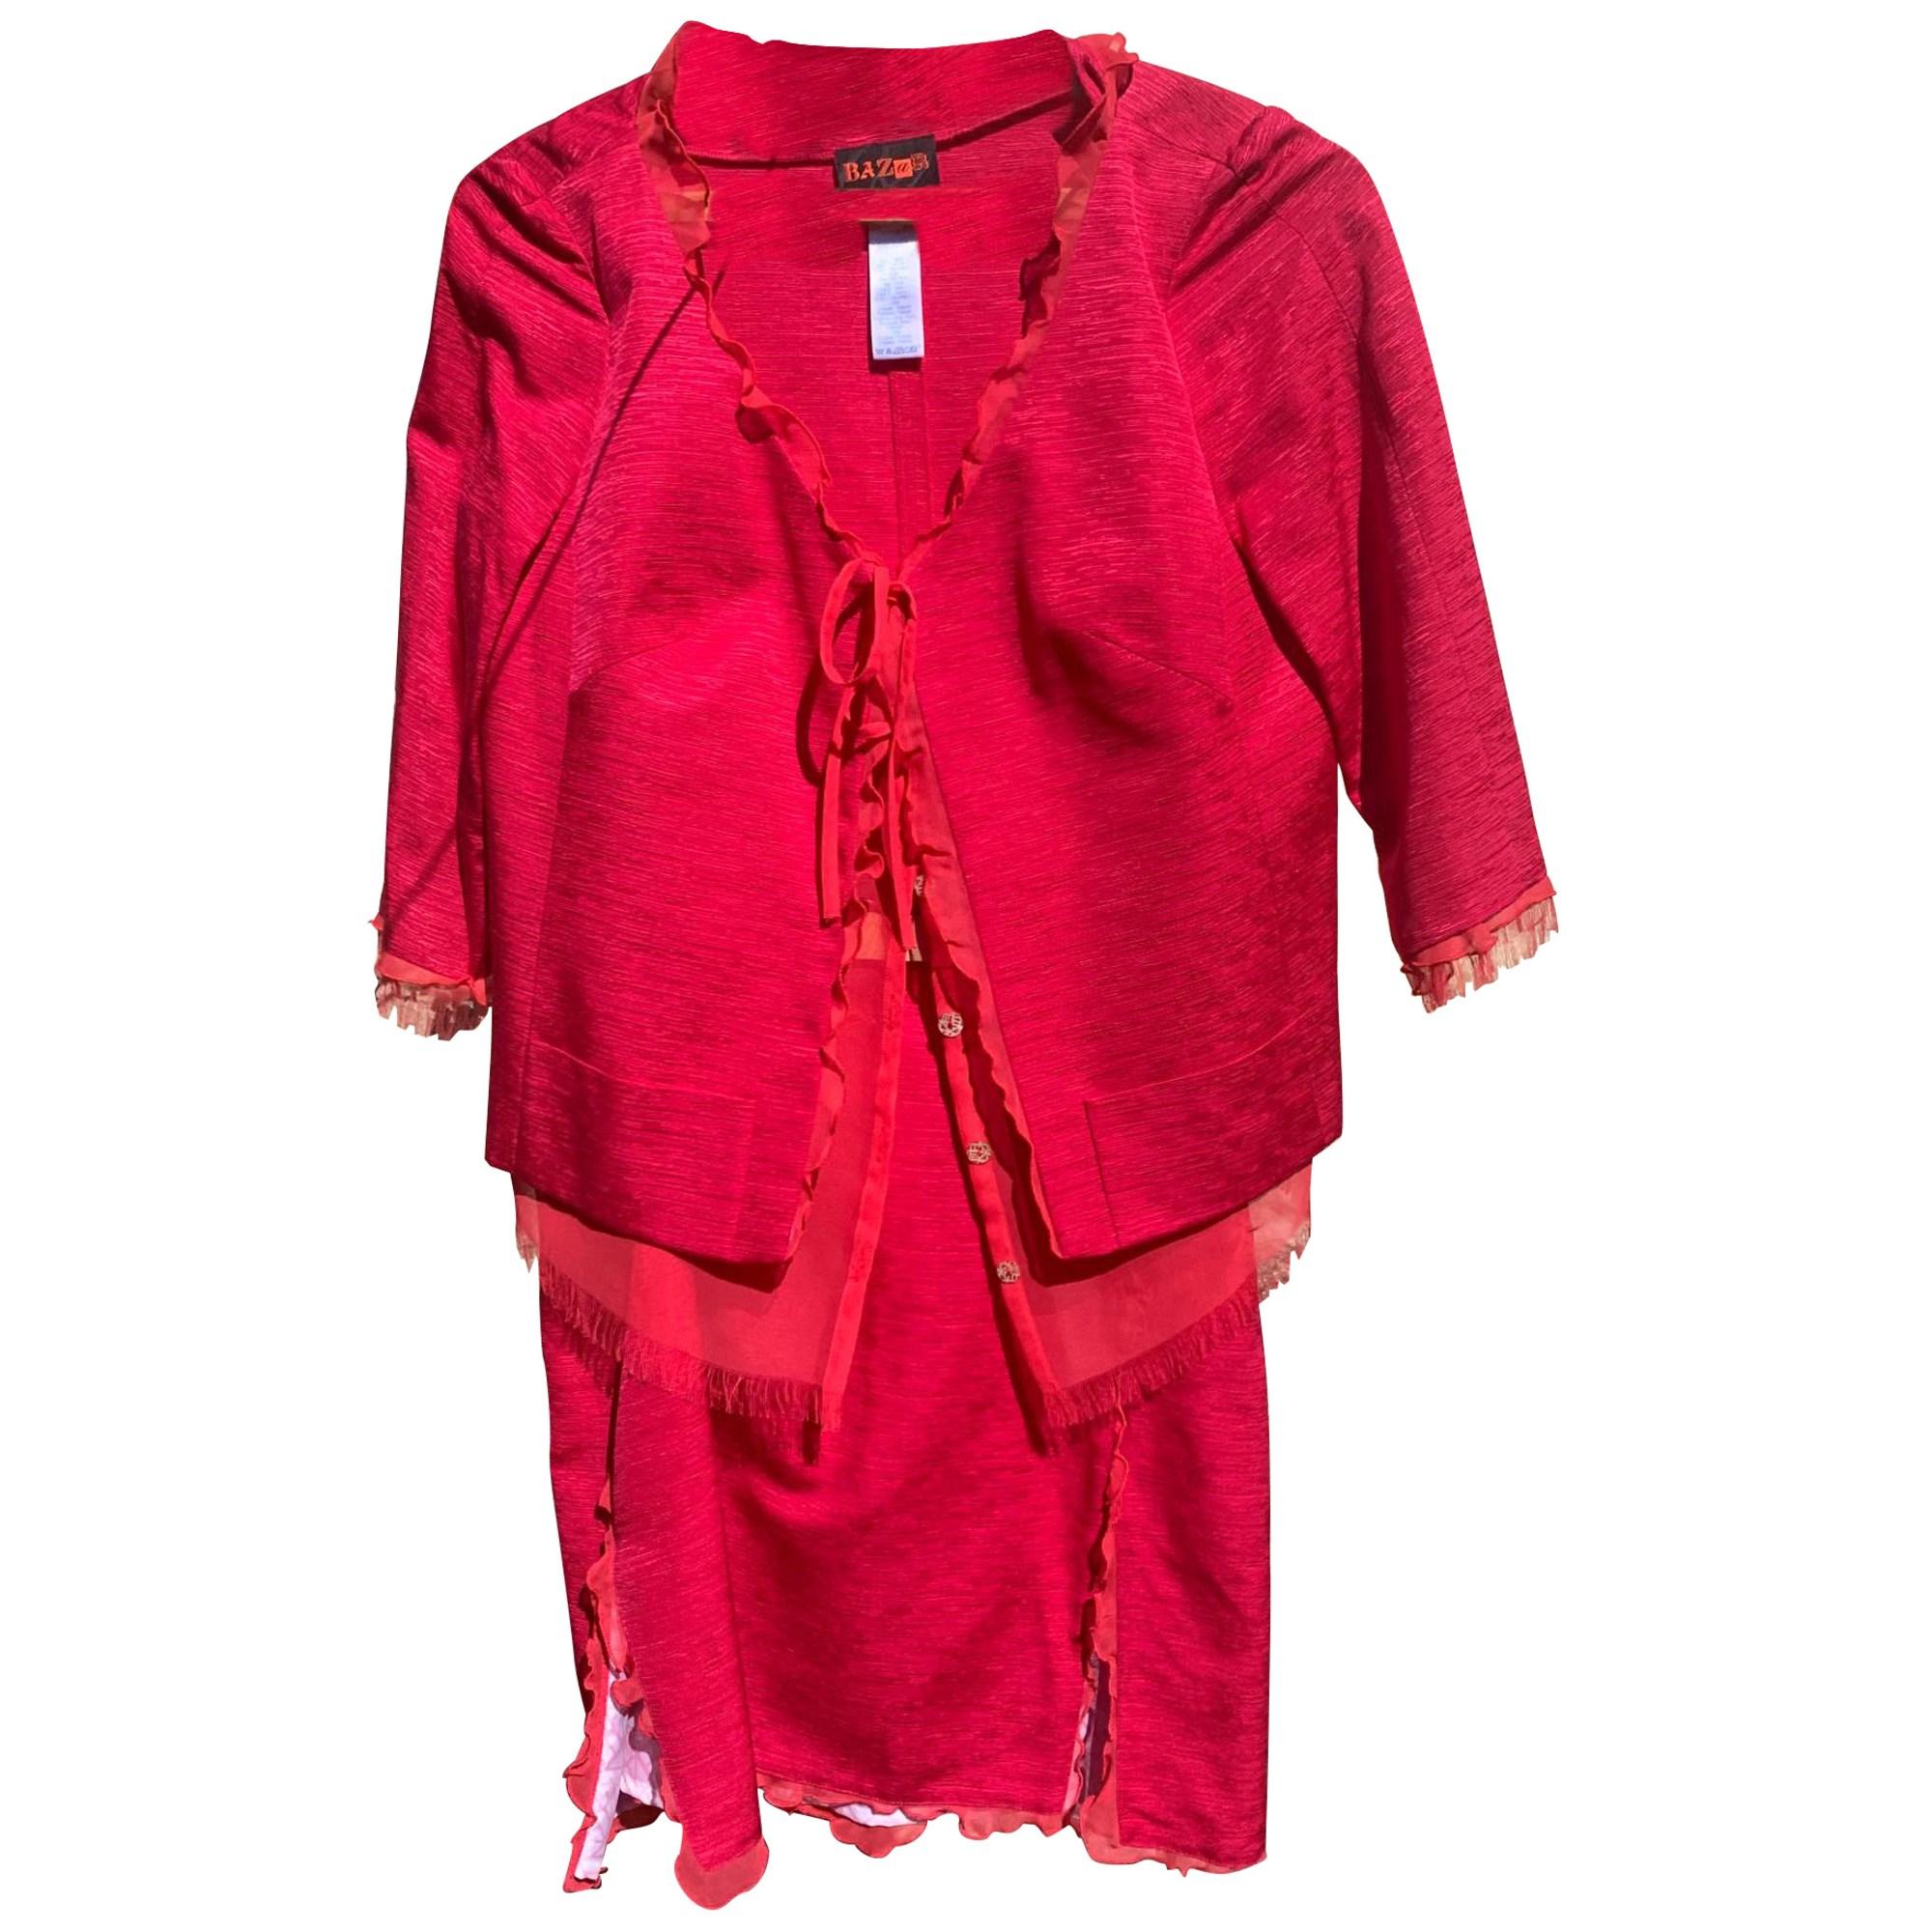 Tailleur jupe CHRISTIAN LACROIX Rose, fuschia, vieux rose